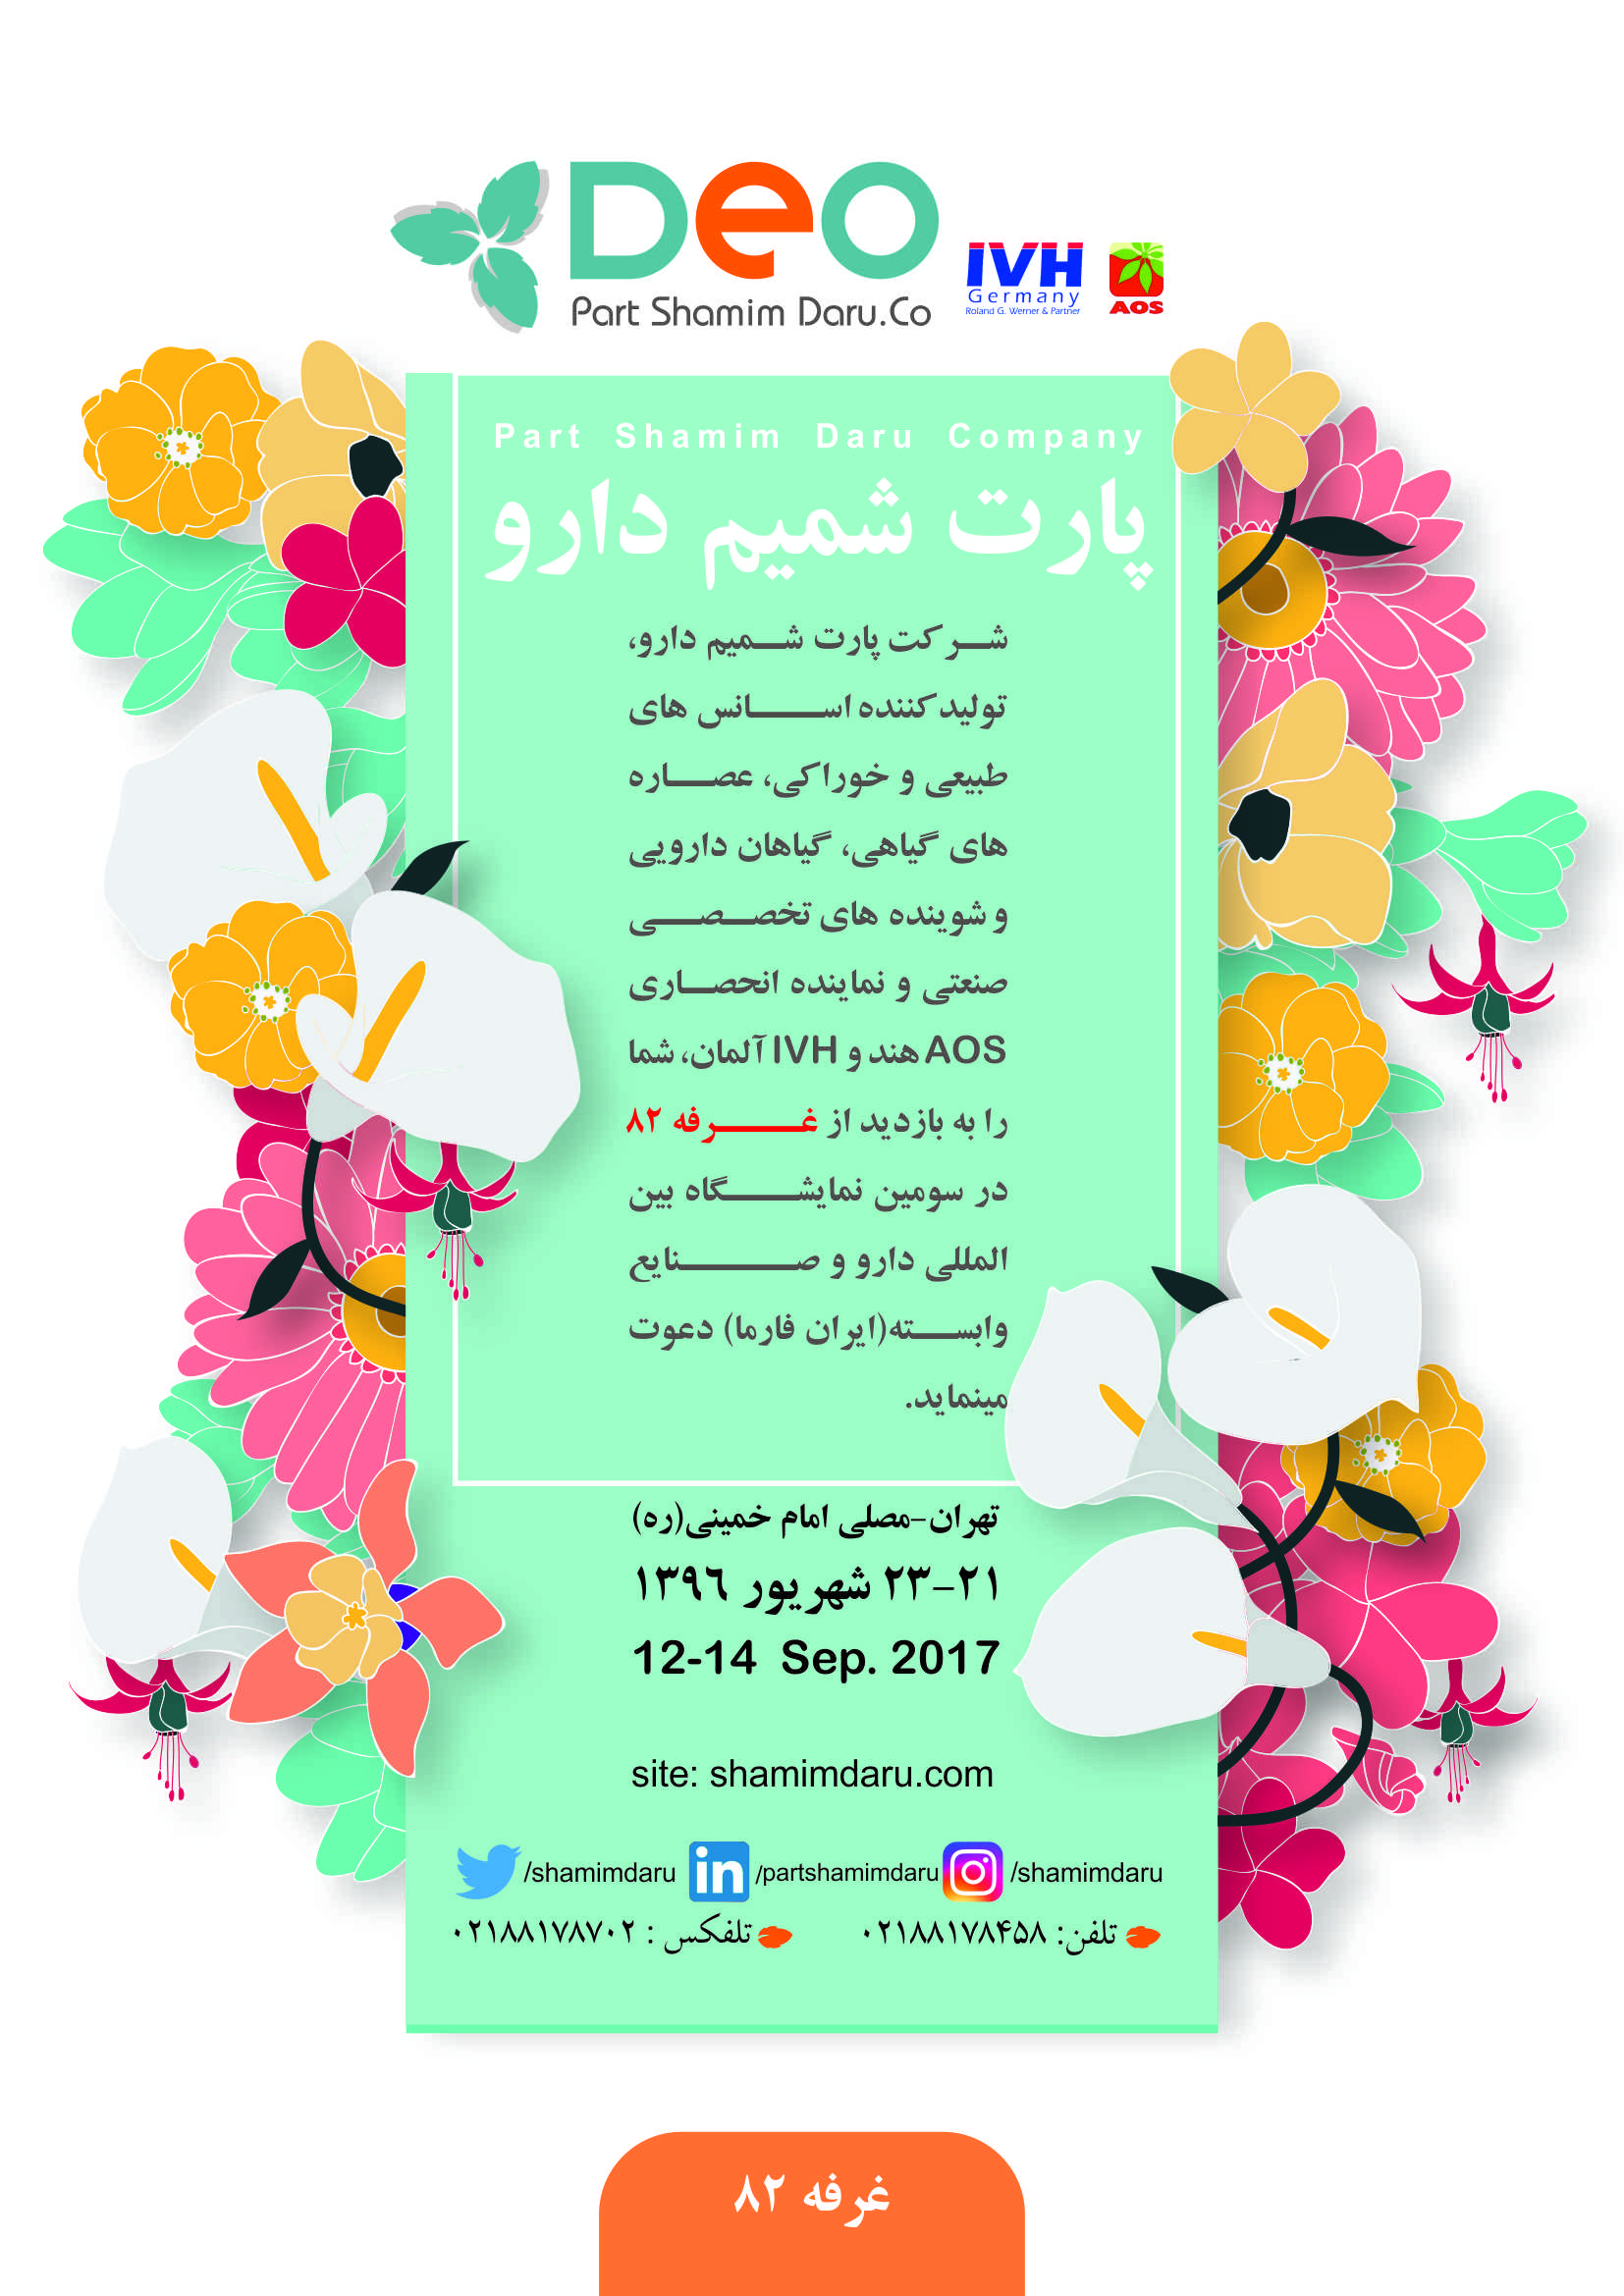 Iran Pharma 2017 Exhibition Invitation